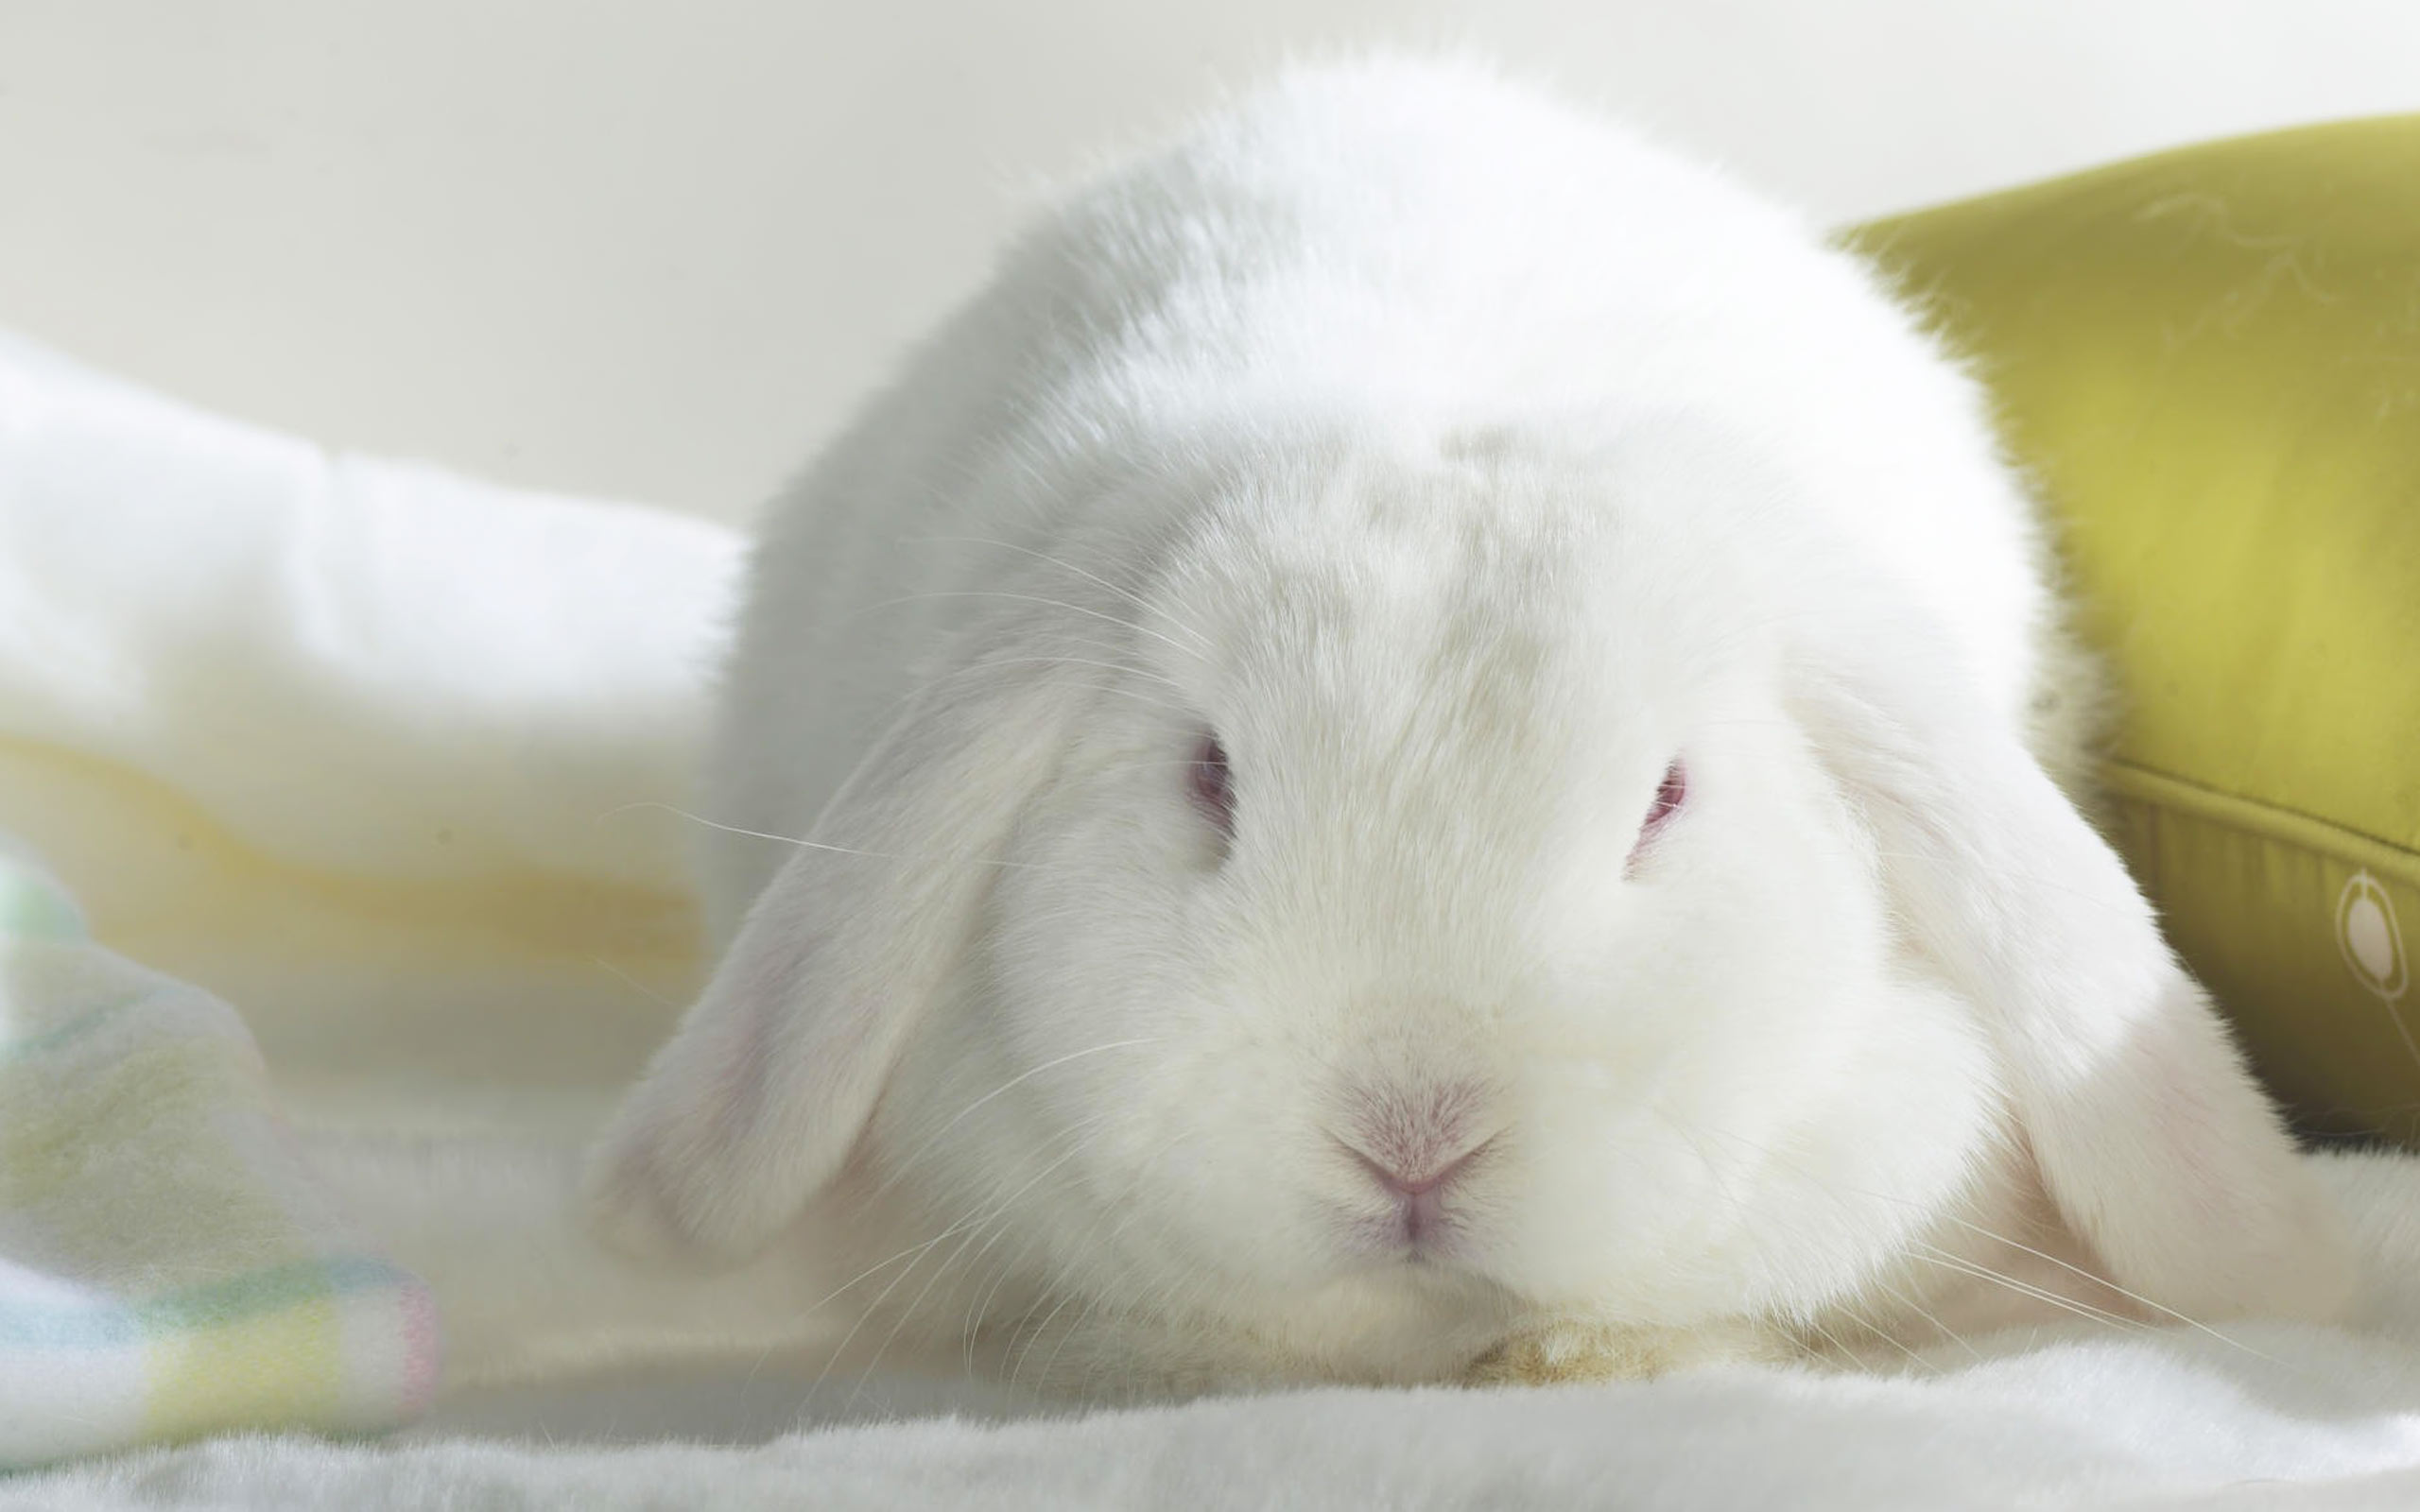 White Bunny Desktop hd Wallpaper High Quality WallpapersWallpaper 2560x1600